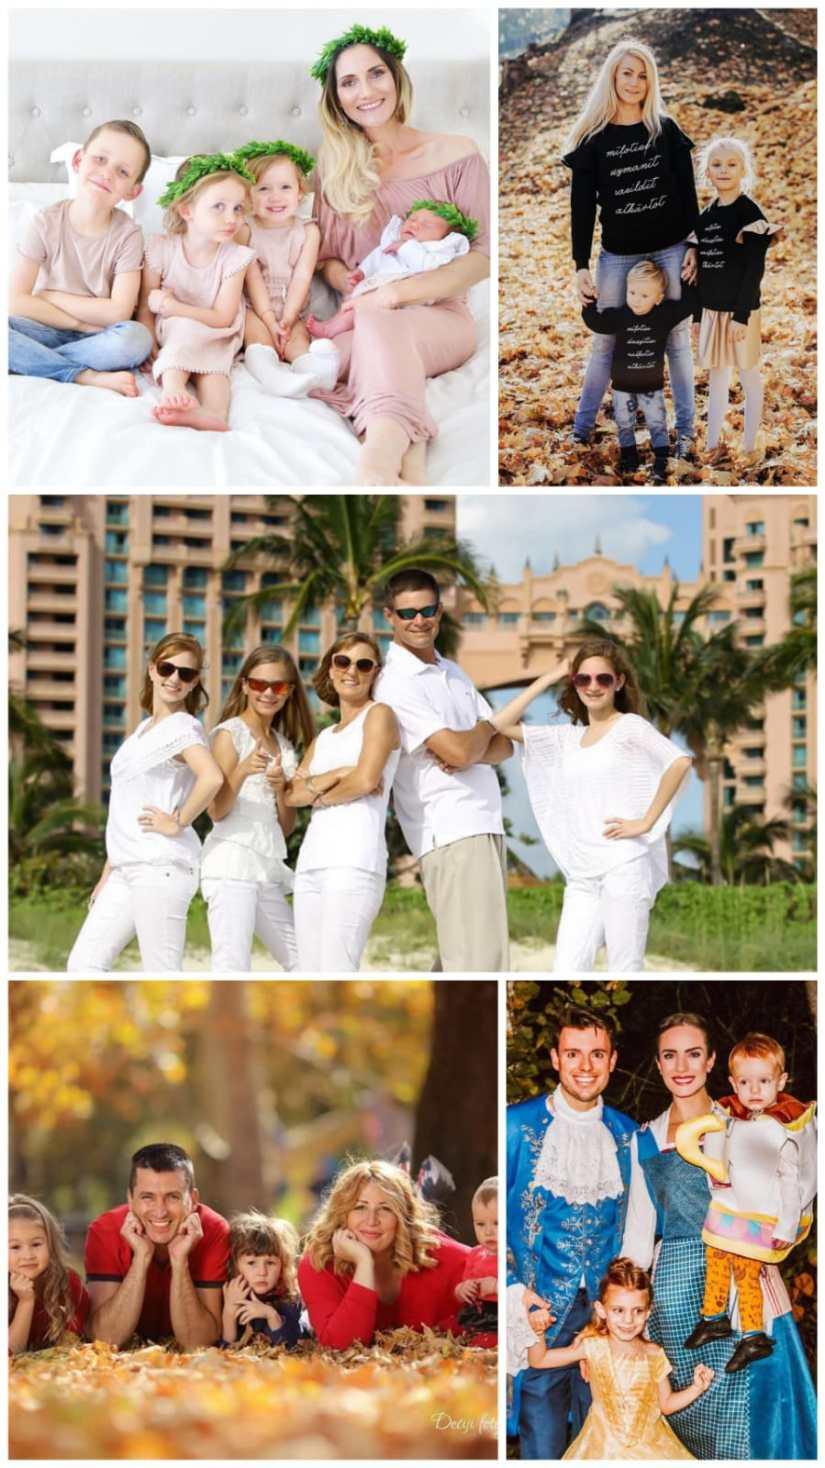 Family Portrait picture Clothing Ideas